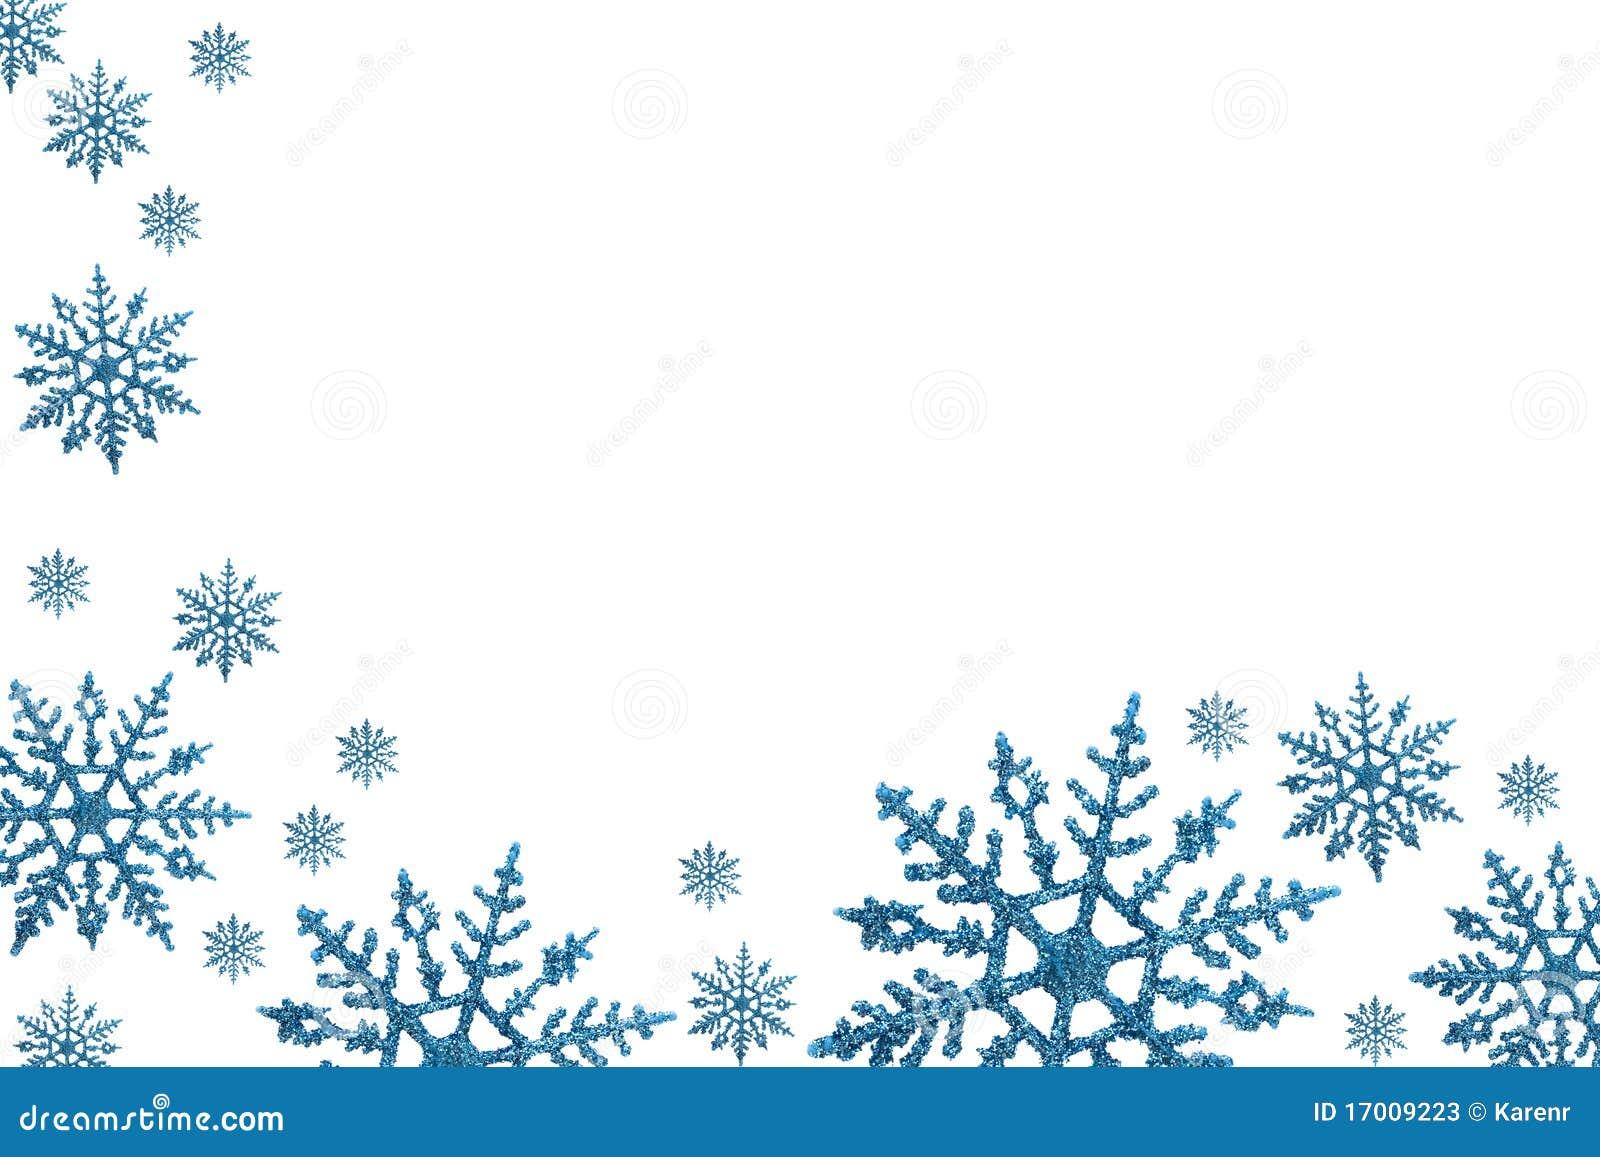 Snowflake border stock image image of season present 17009223 snowflake border publicscrutiny Images